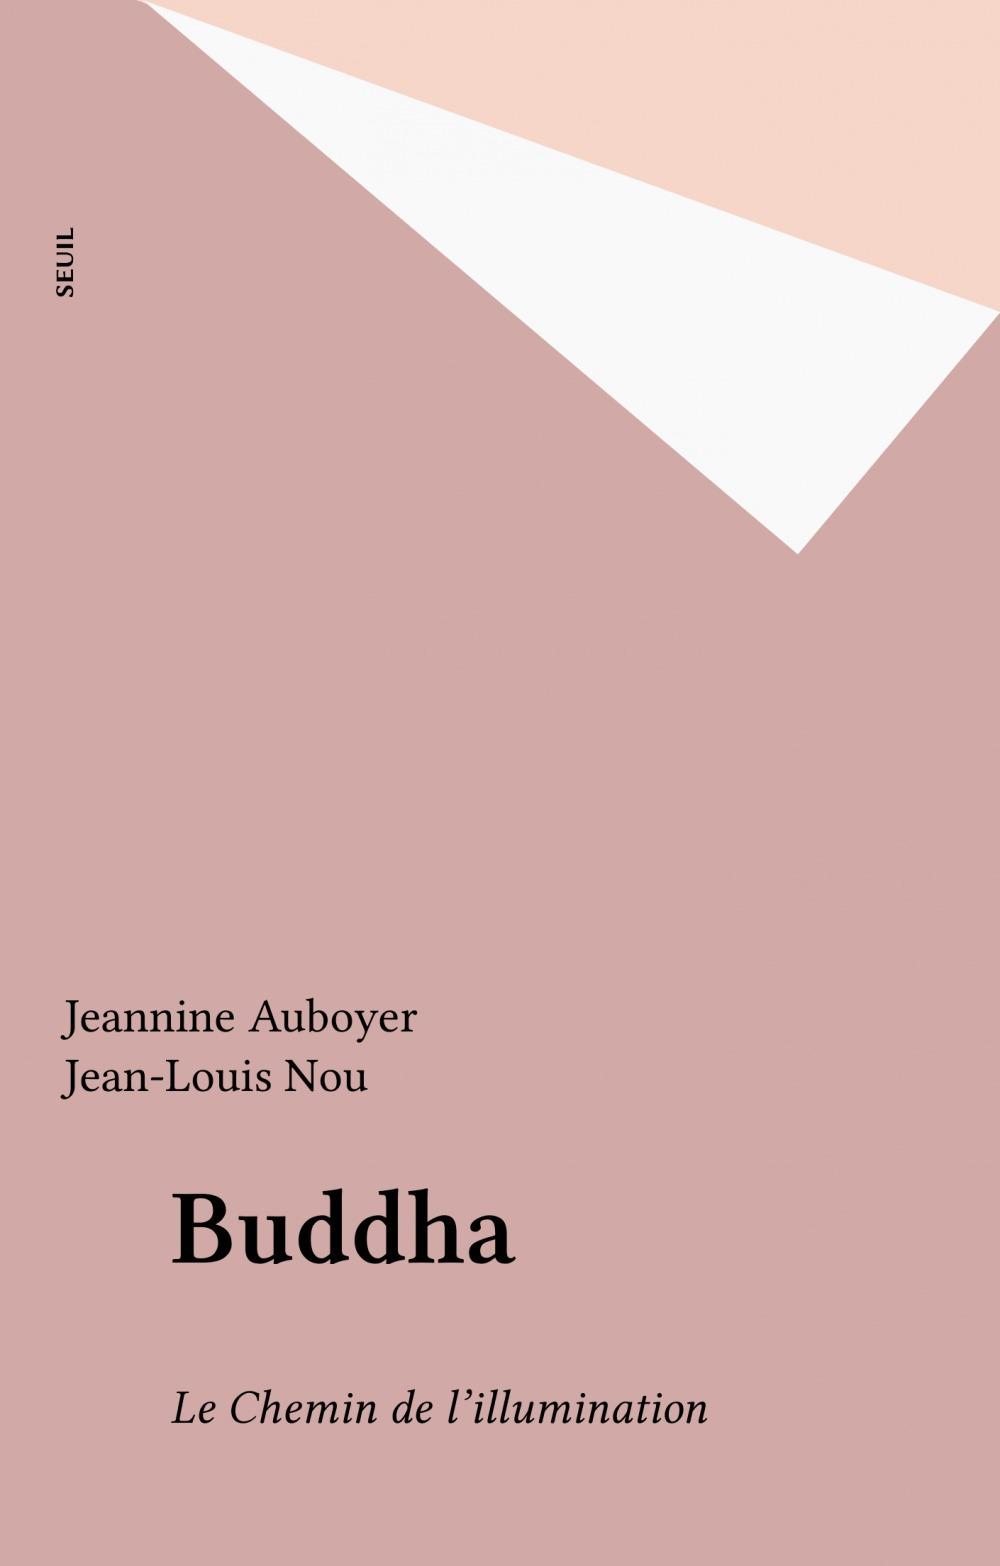 Buddha  - Jeannine Auboyer  - Jean-Louis Nou